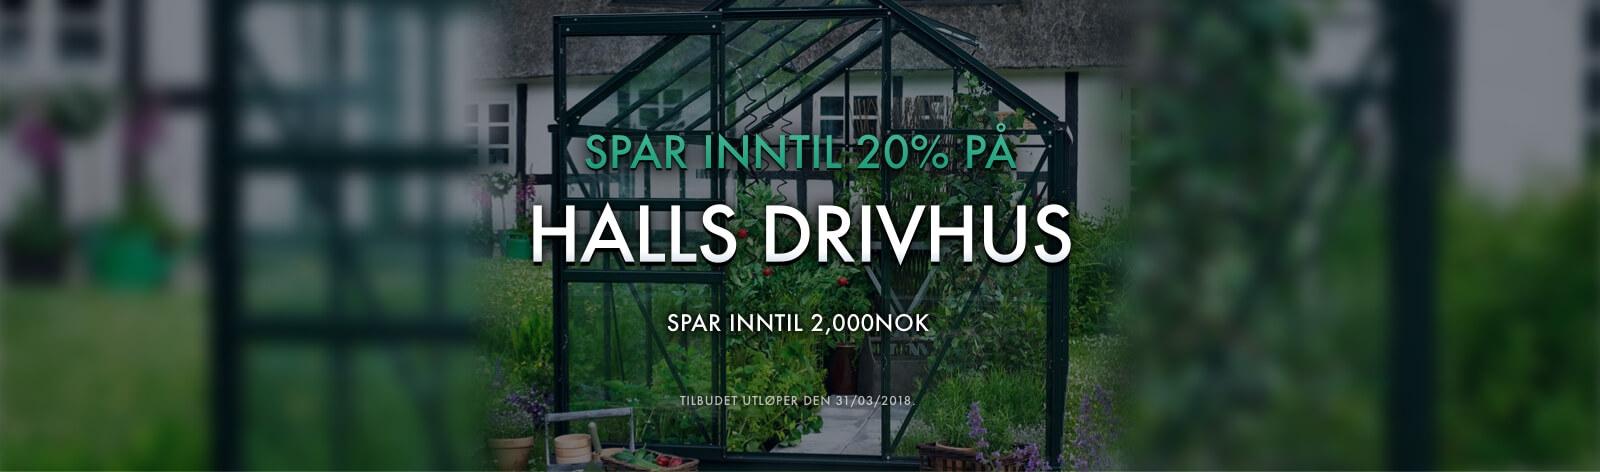 Universal Drivhus